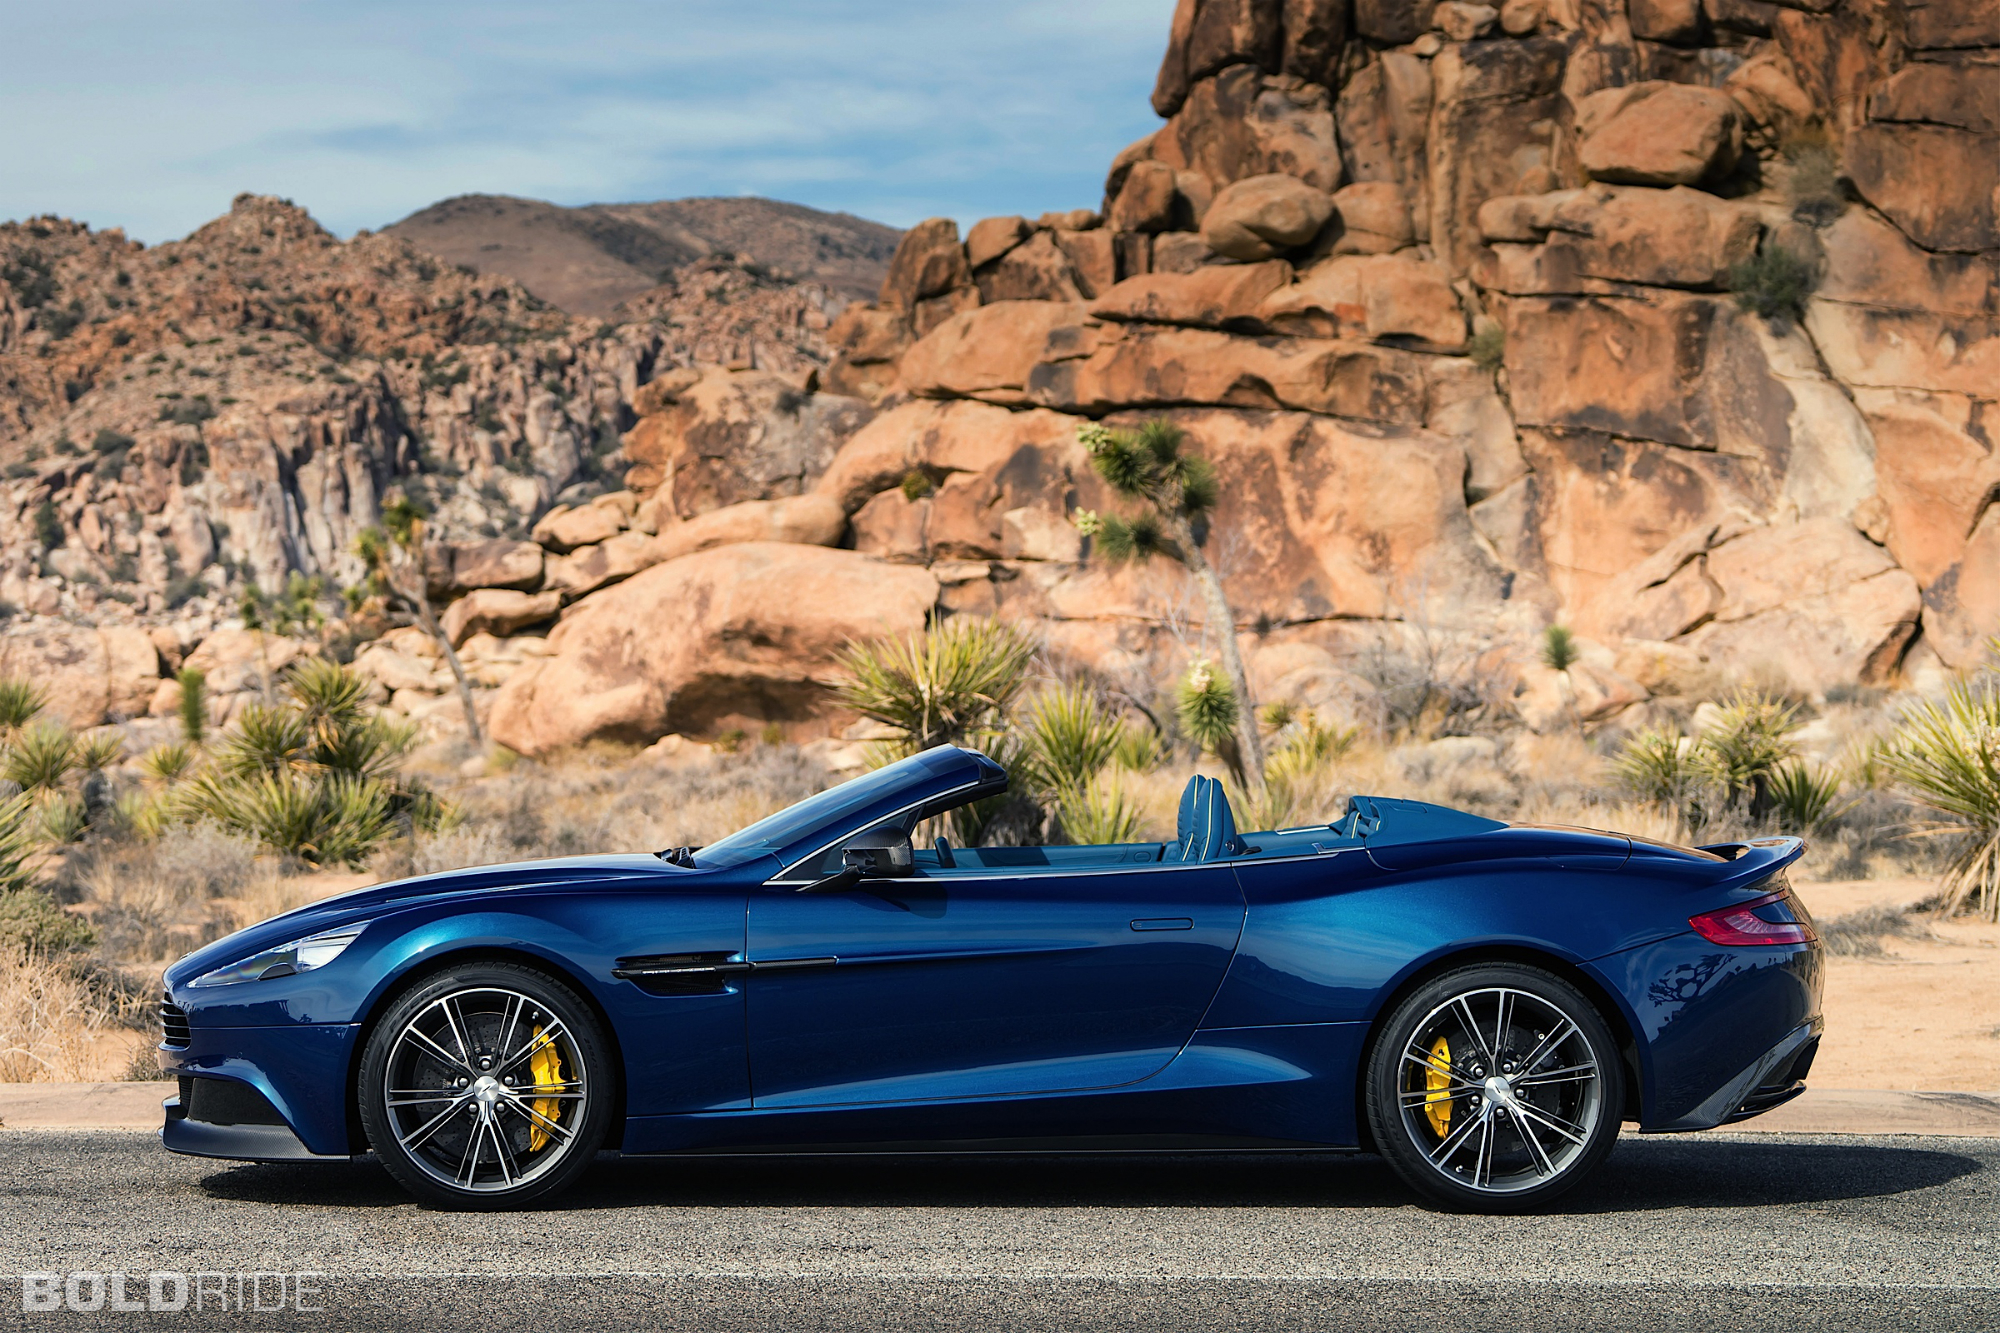 2014 Aston Martin Vanquish Volante 1280 x 1080